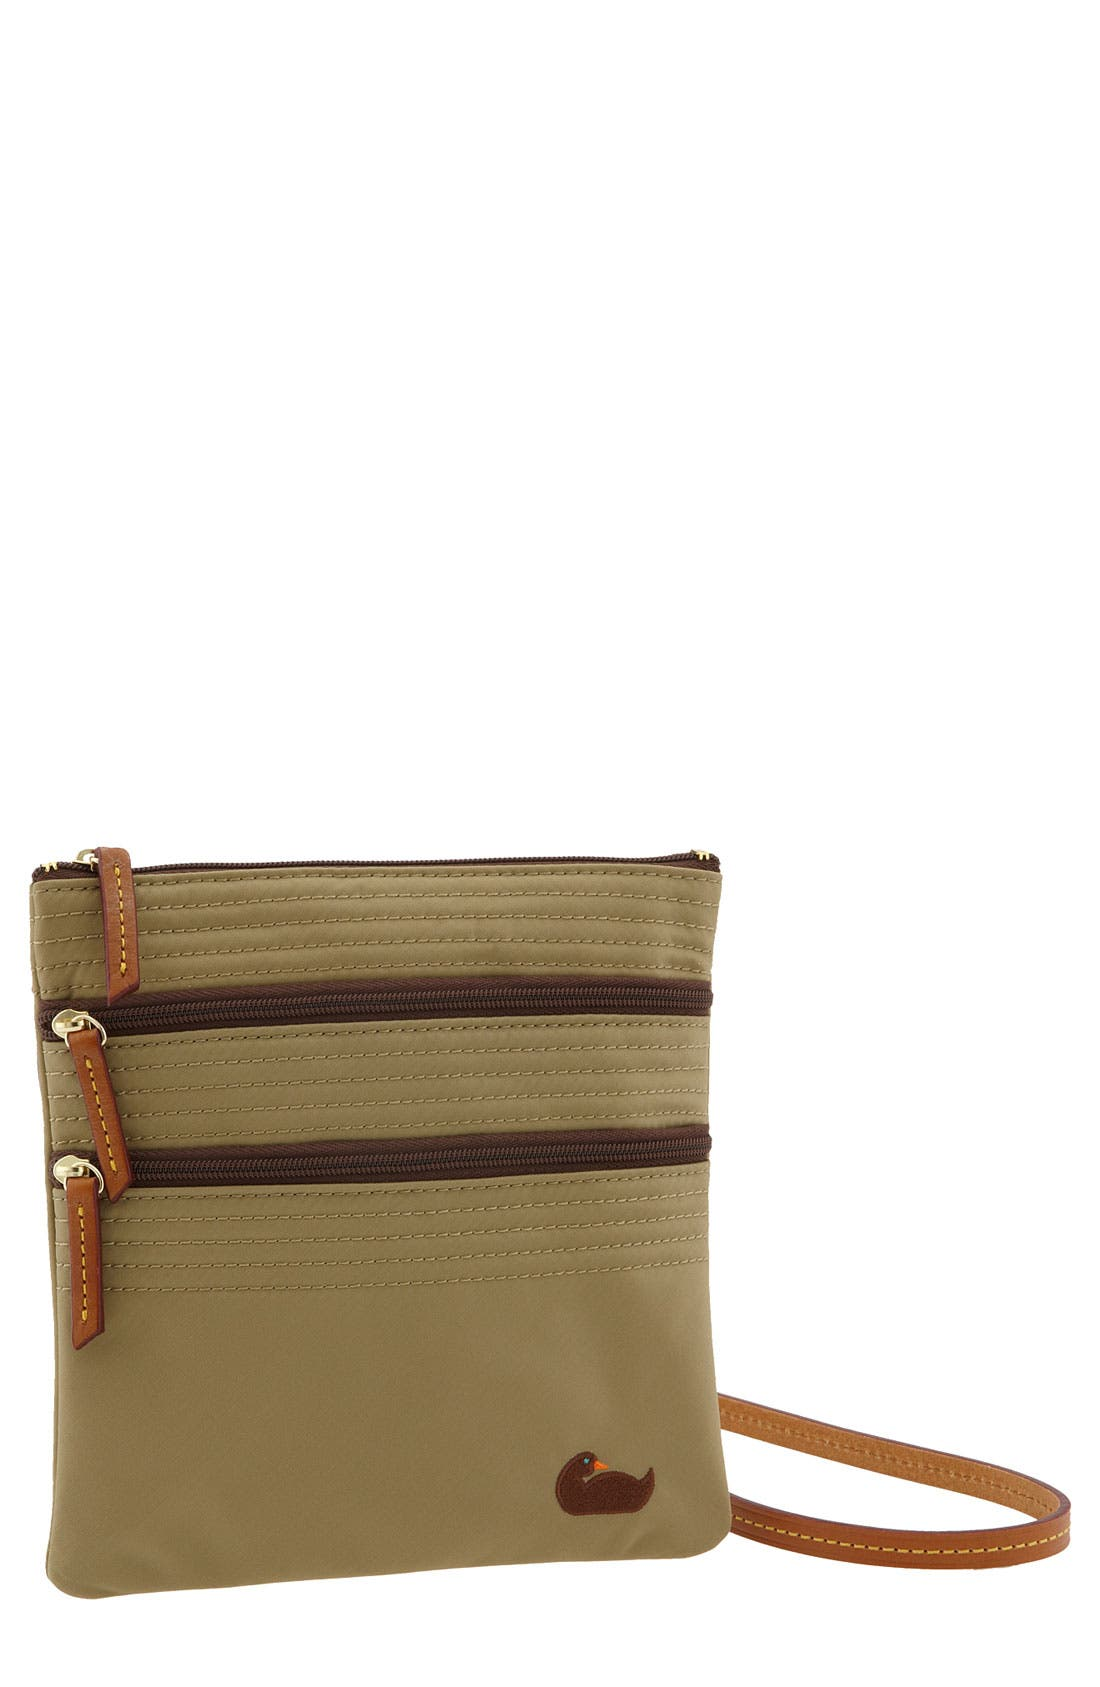 Main Image - Dooney & Bourke 'Triple Zip' Nylon Crossbody Bag